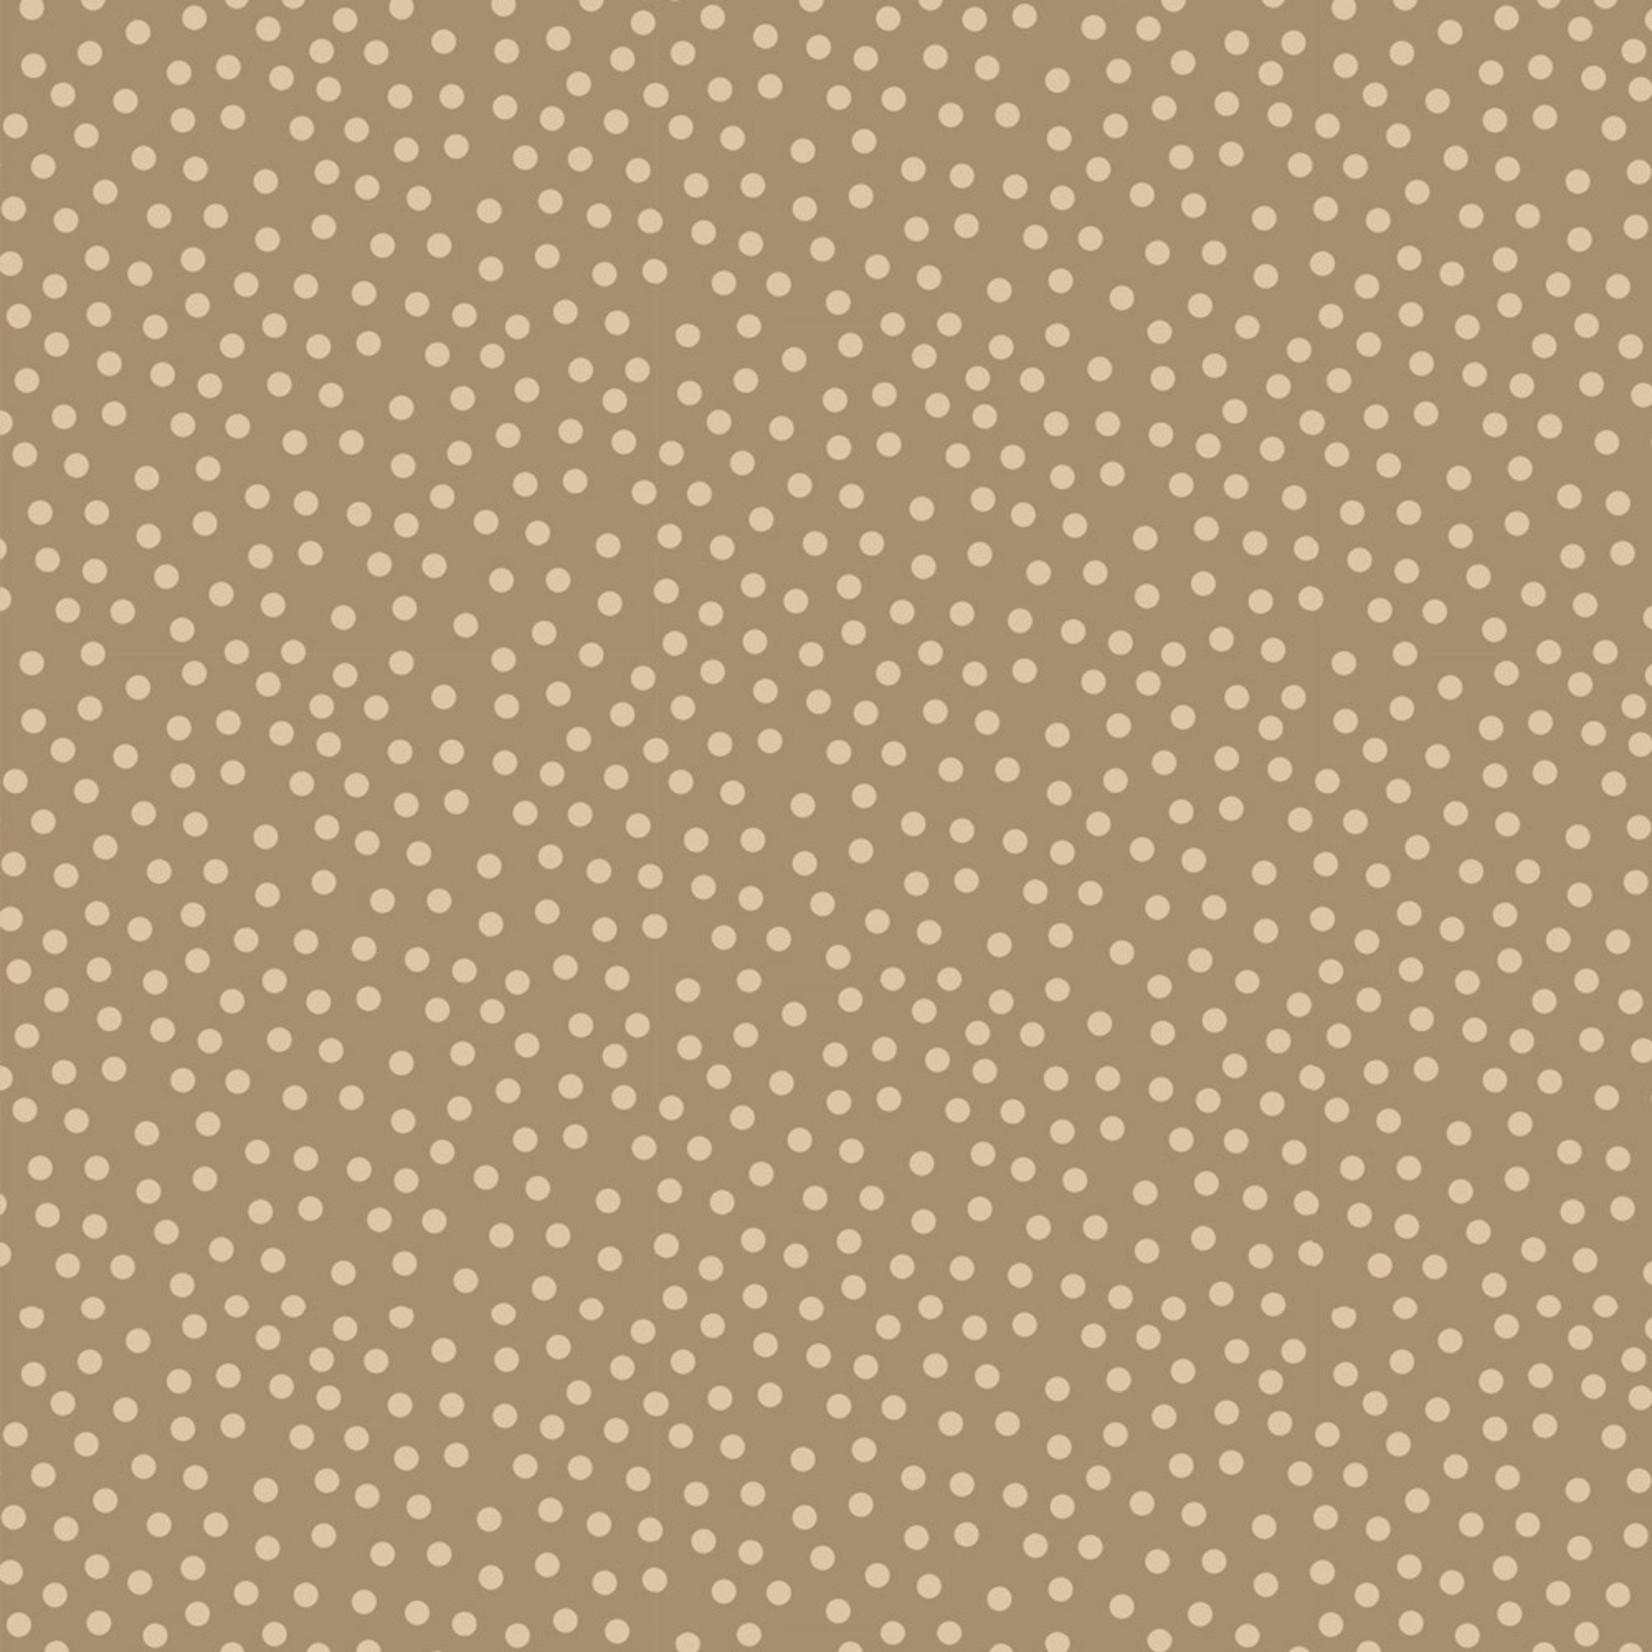 Stoffabrics Hannah Basic - Dotted - Taupe